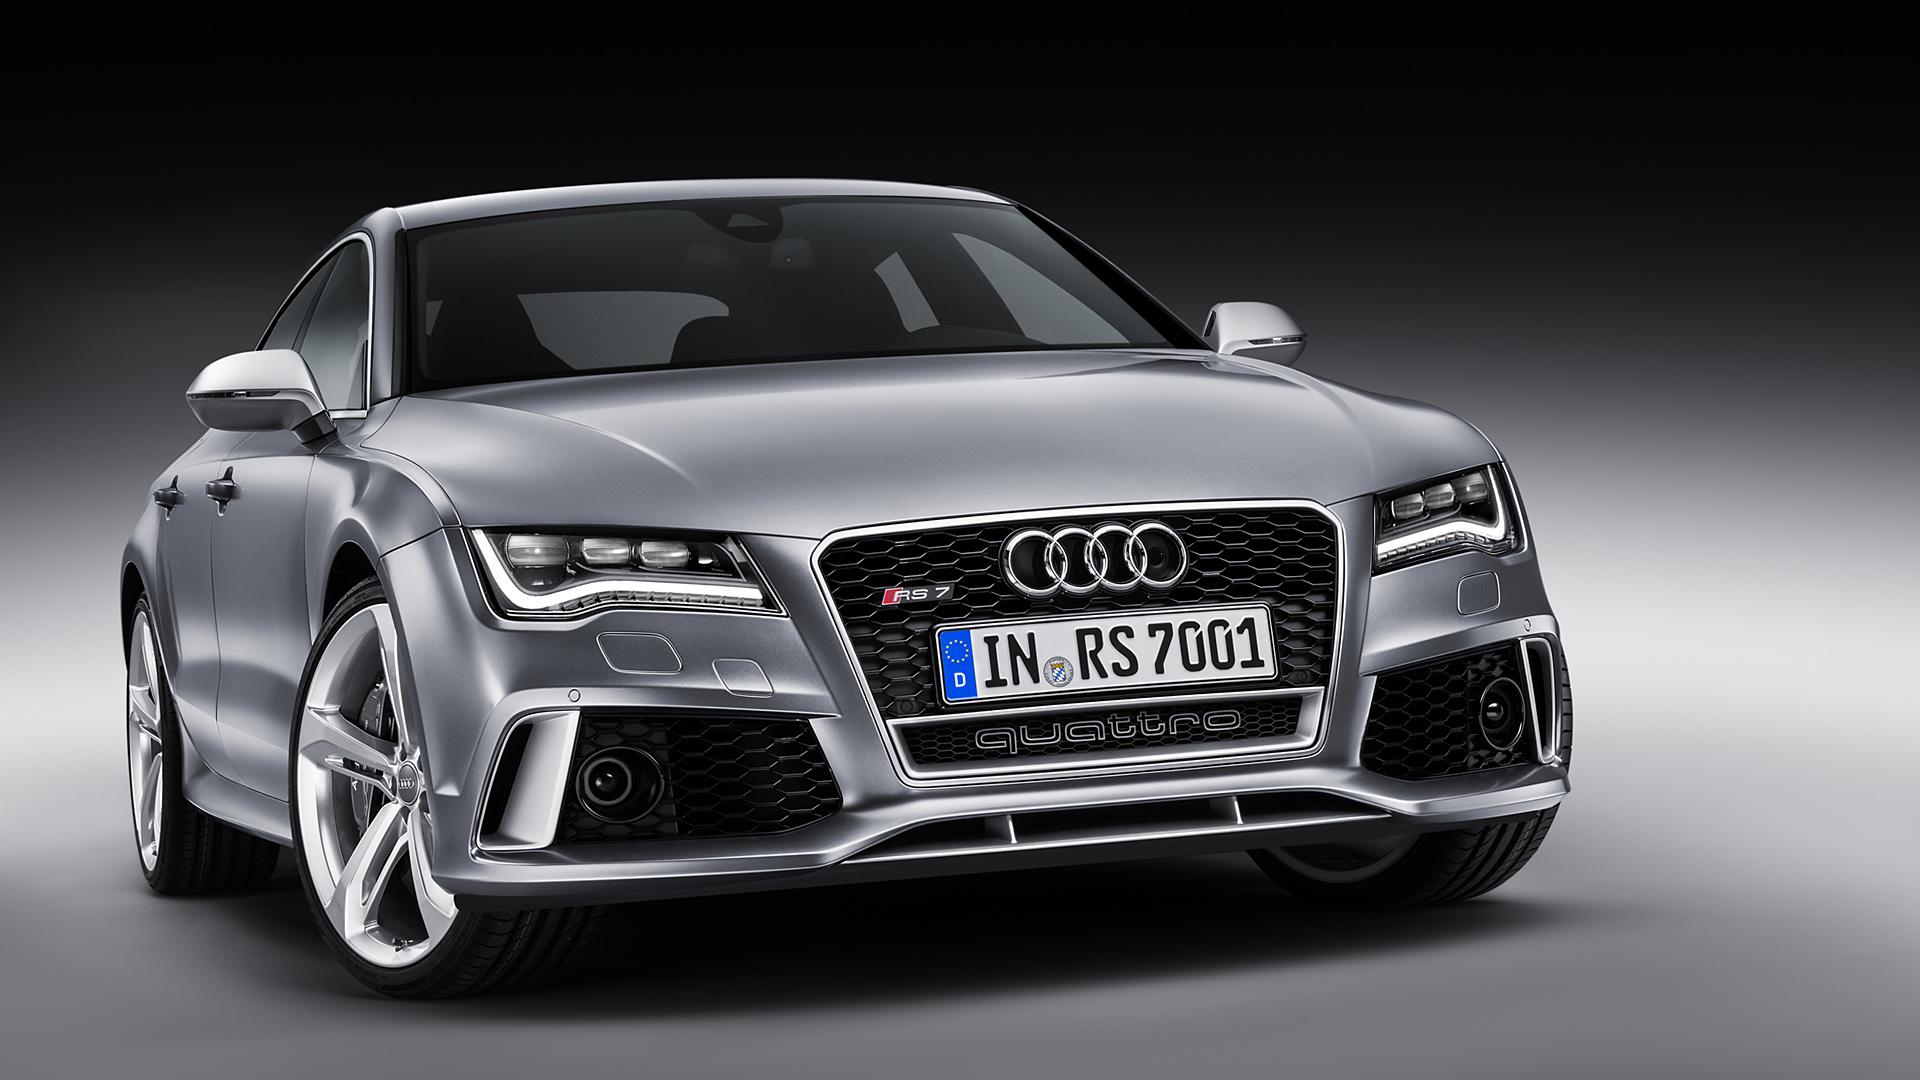 Audi 2014 Audi RS7  HD Wallpaper